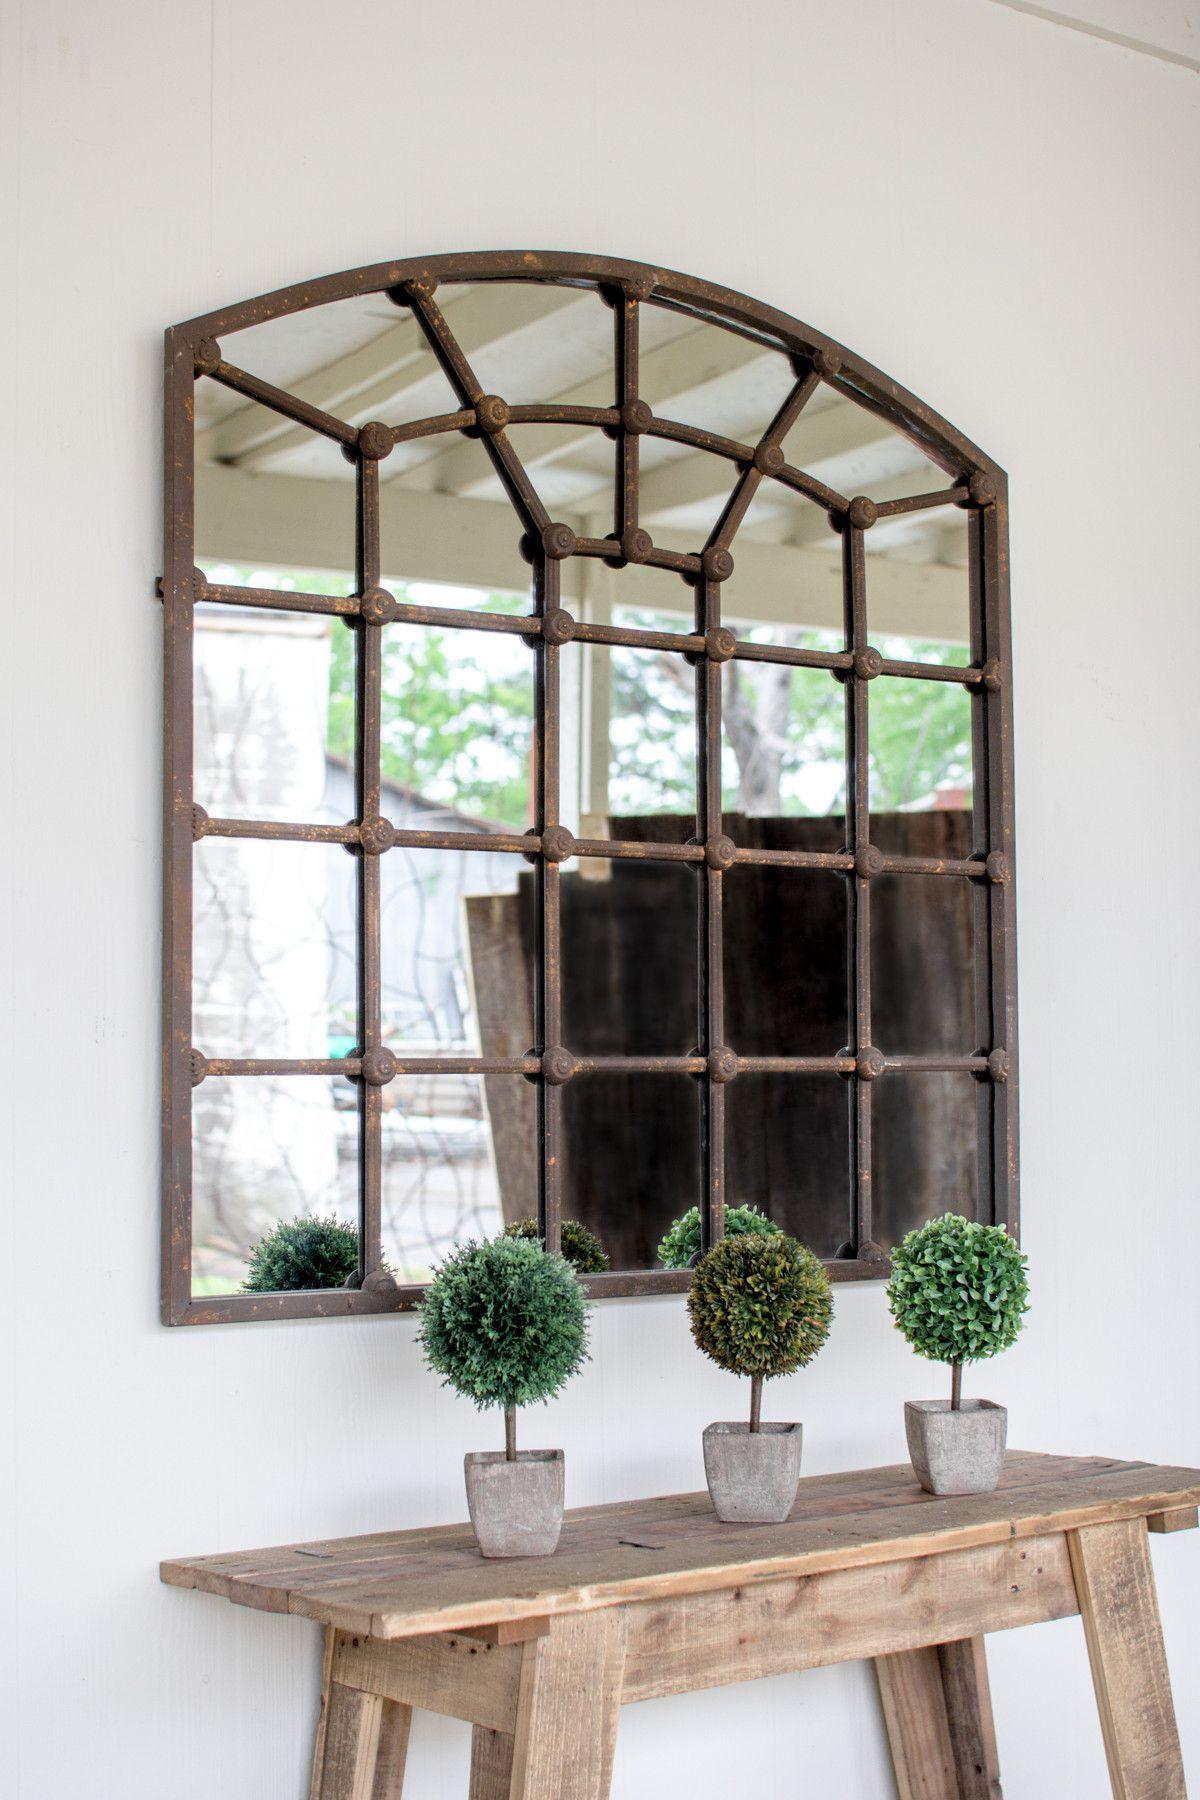 Arched iron mirror Tuscan design, Decor, Rustic furniture